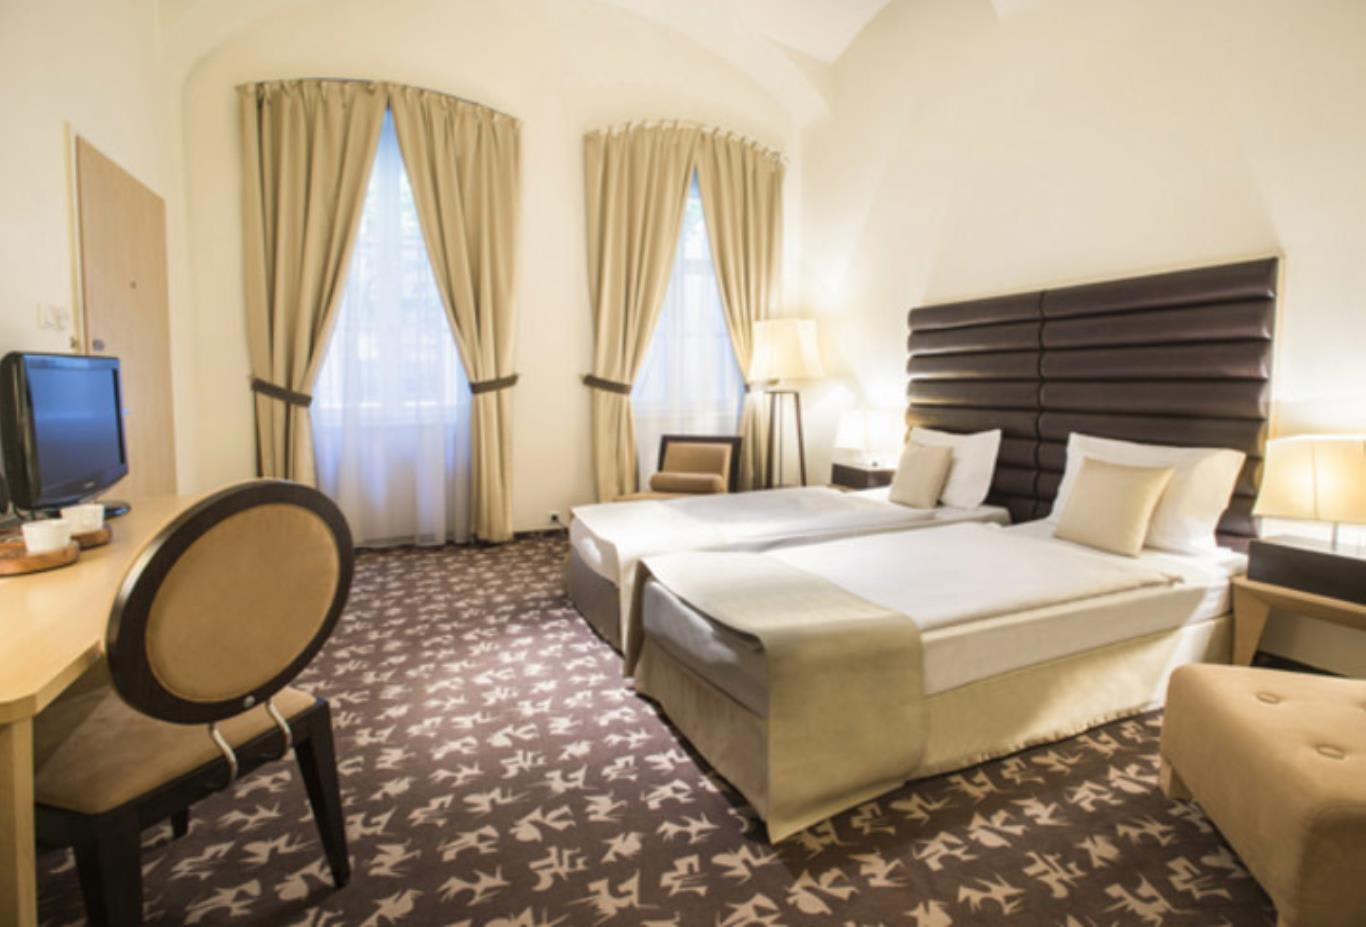 Superor-Room-twin-beds